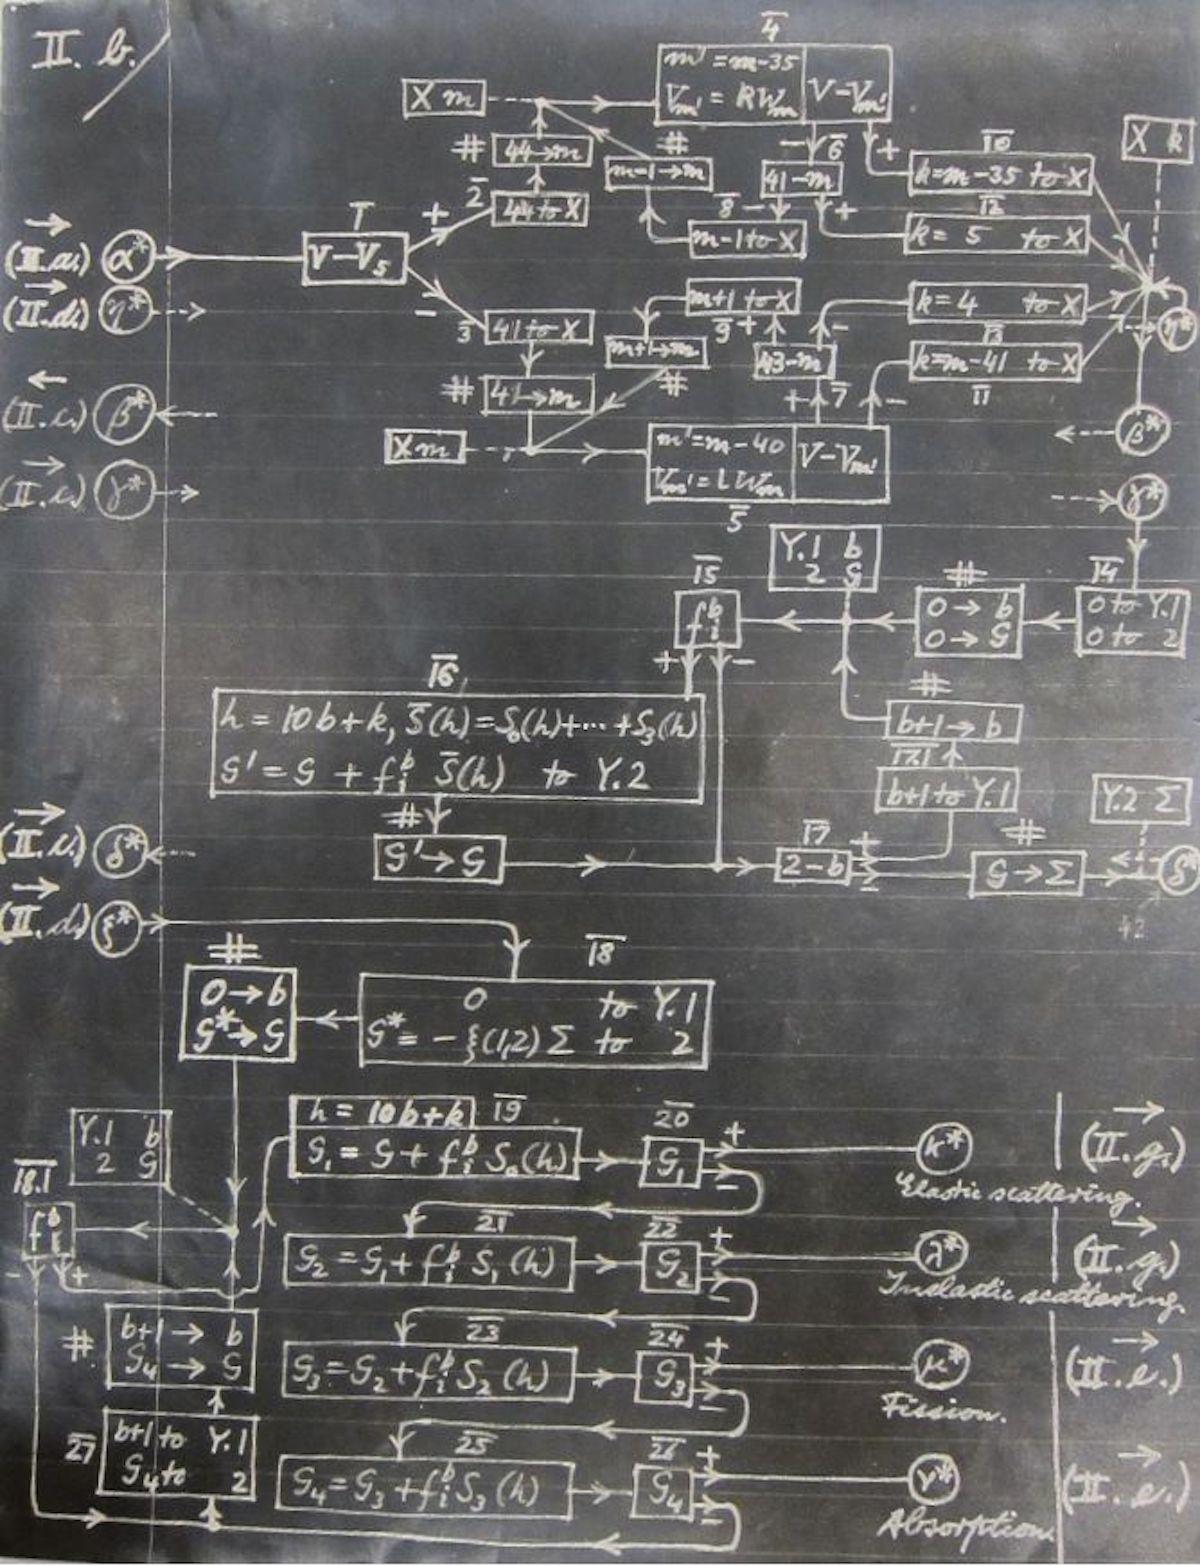 More of Von Neumann's ENIAC algorithm